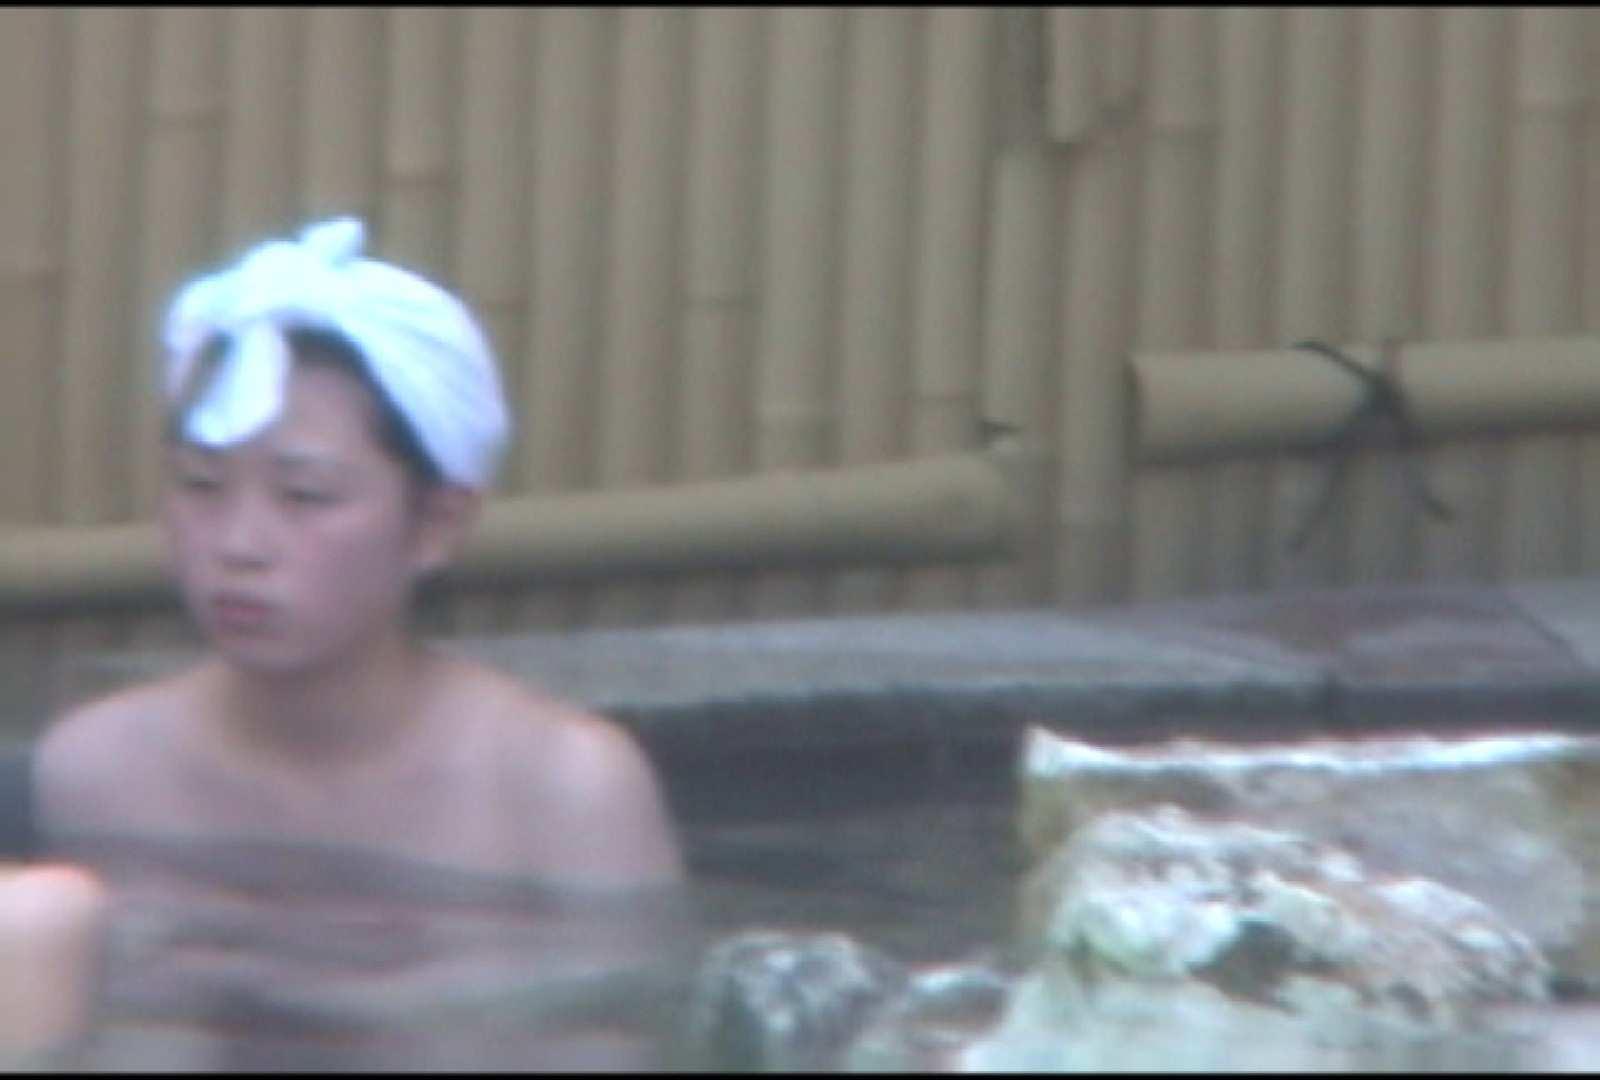 Aquaな露天風呂Vol.146 盗撮映像  73Pix 8